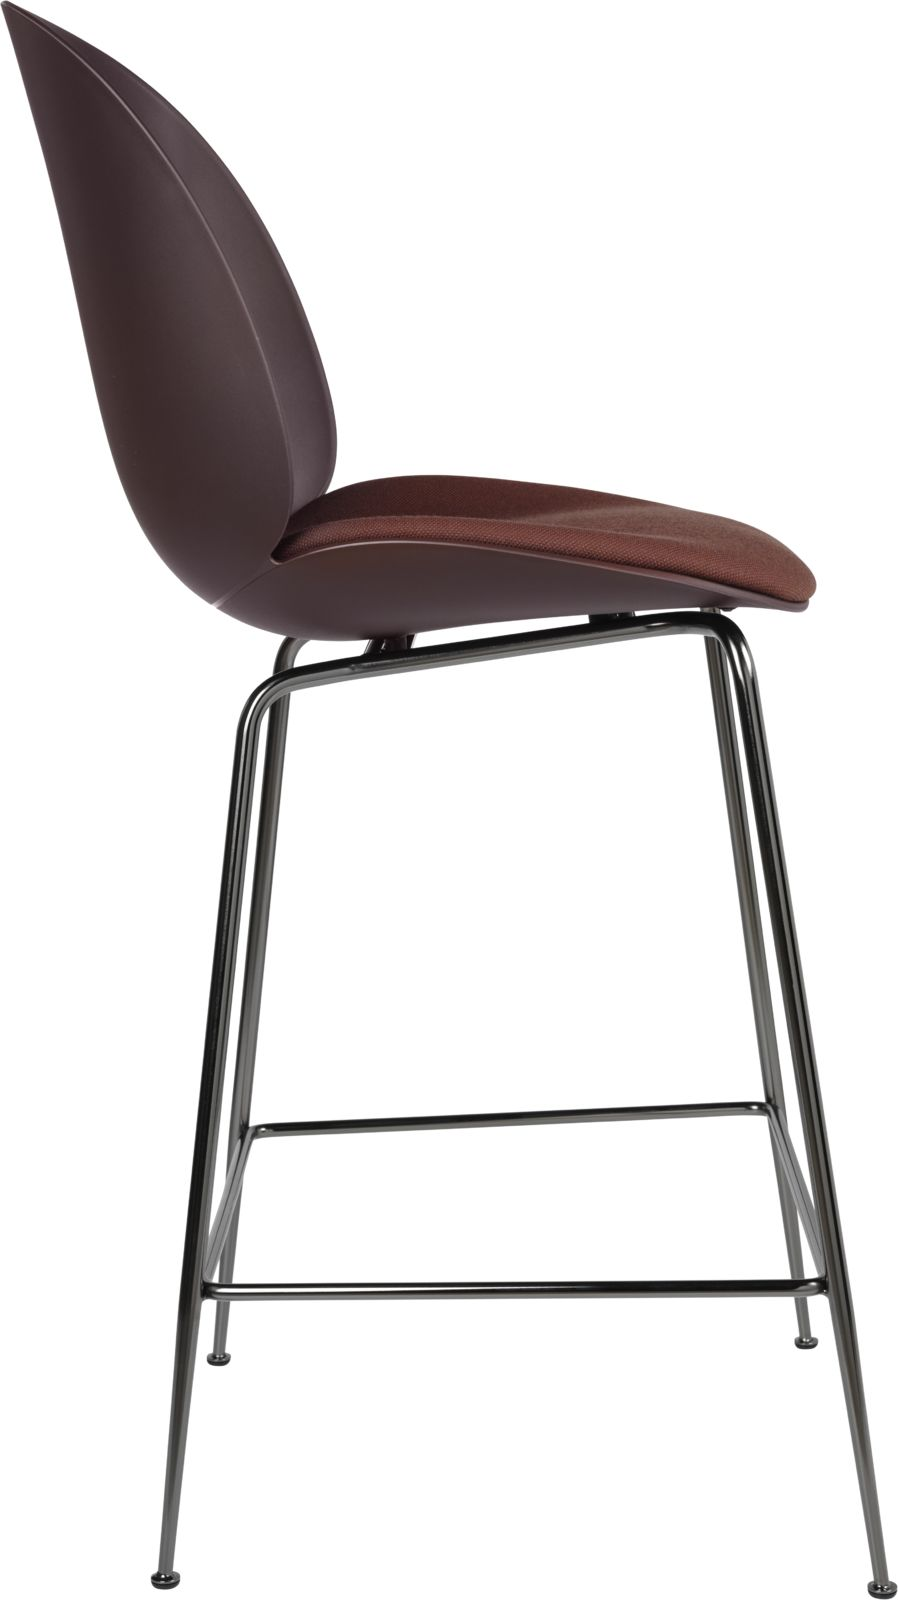 Gubi Beetle Bar Chair Plastic Shell Metal Legs